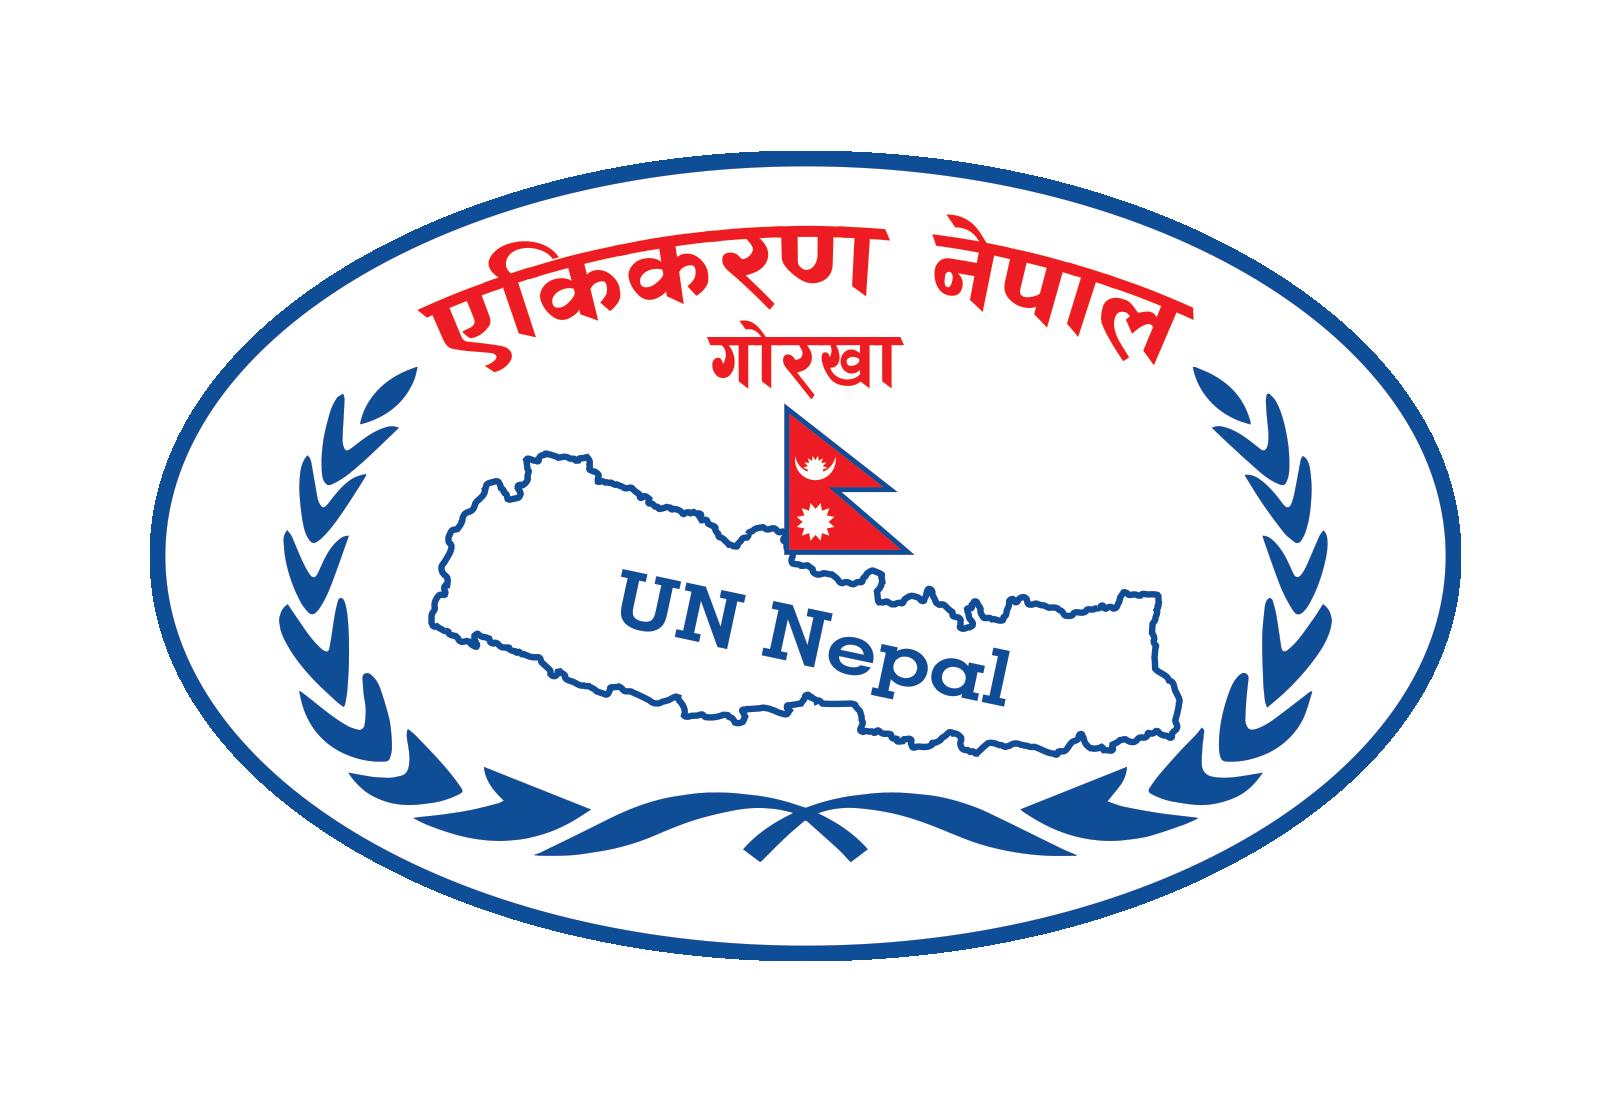 UN Nepal